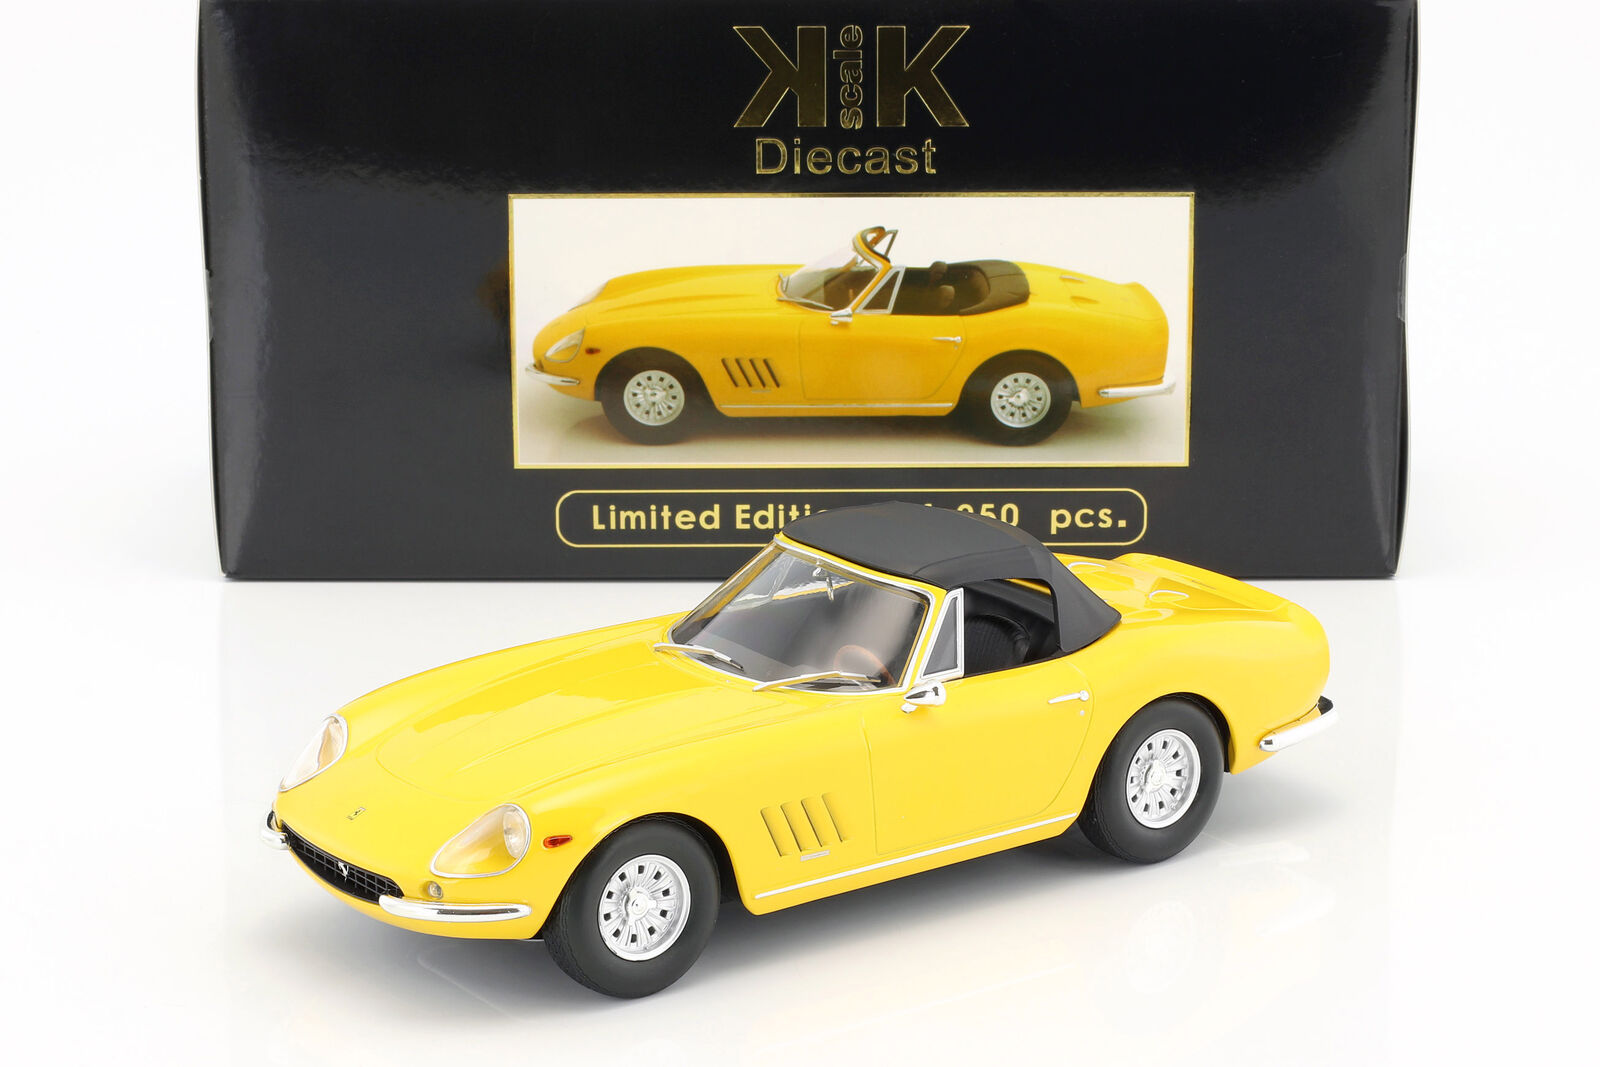 Ferrari 275 gts 4 Nuts Spyder avec jantes Alu année modèle 1967 jaune 1 18 KK-Scale